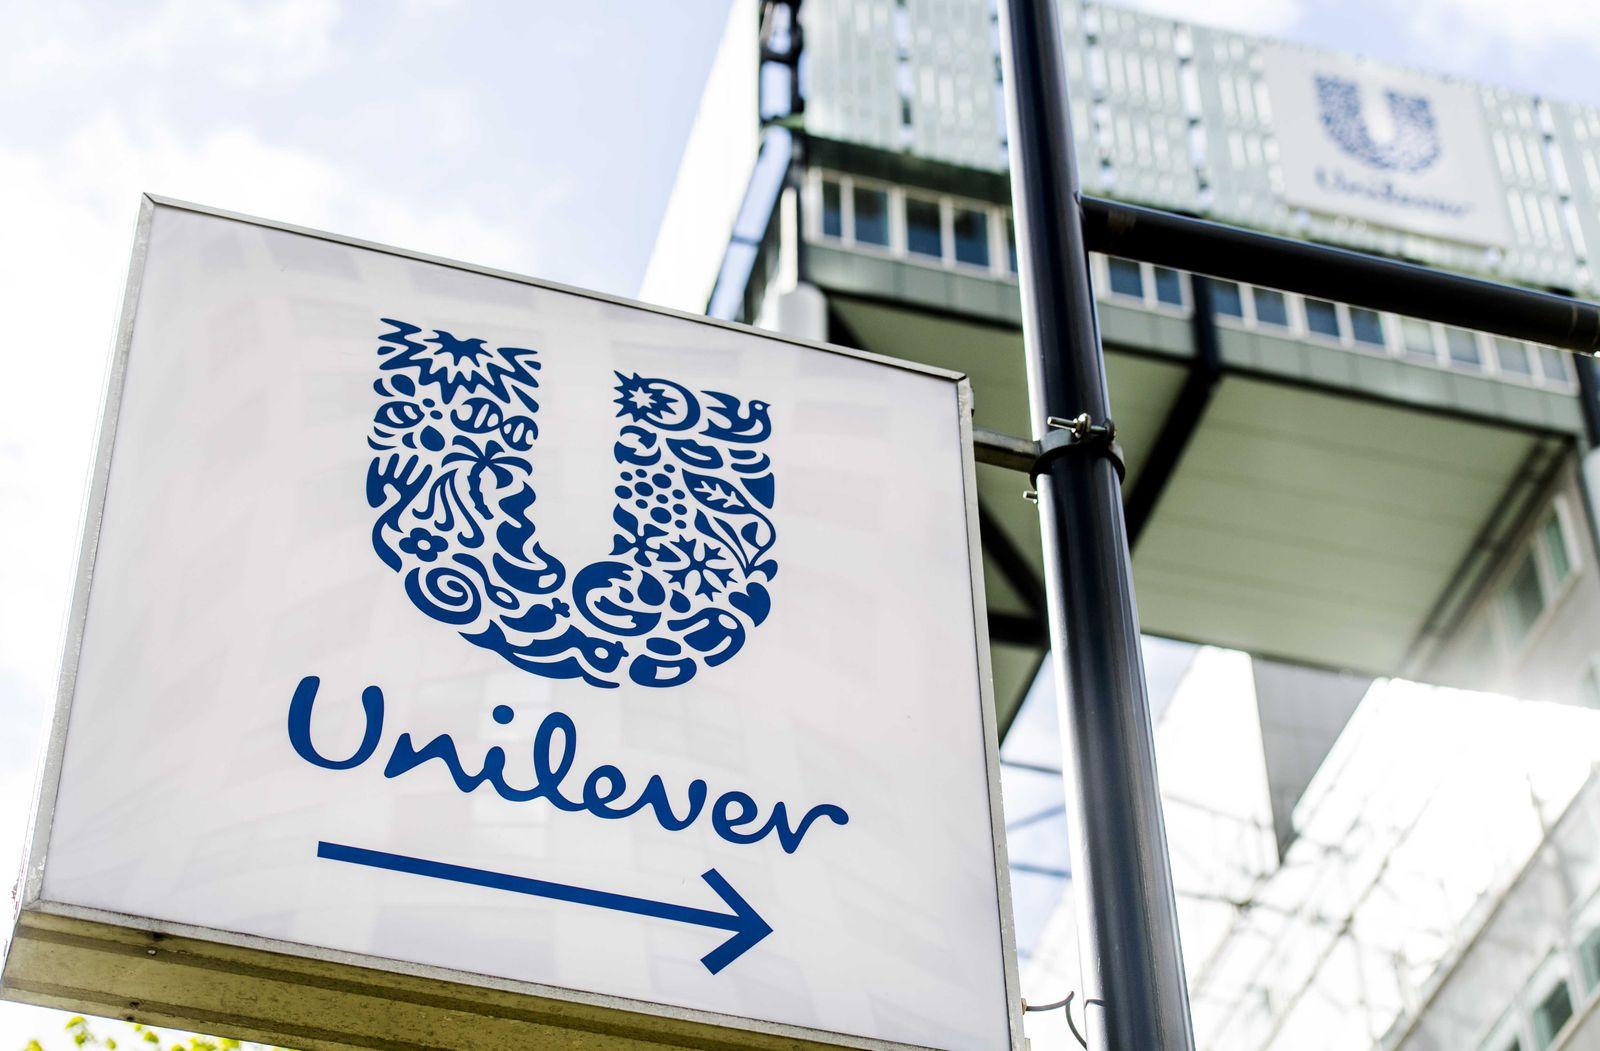 Unilever Q3 trading statement, Rotterdam, Netherlands - 06 Apr 2017